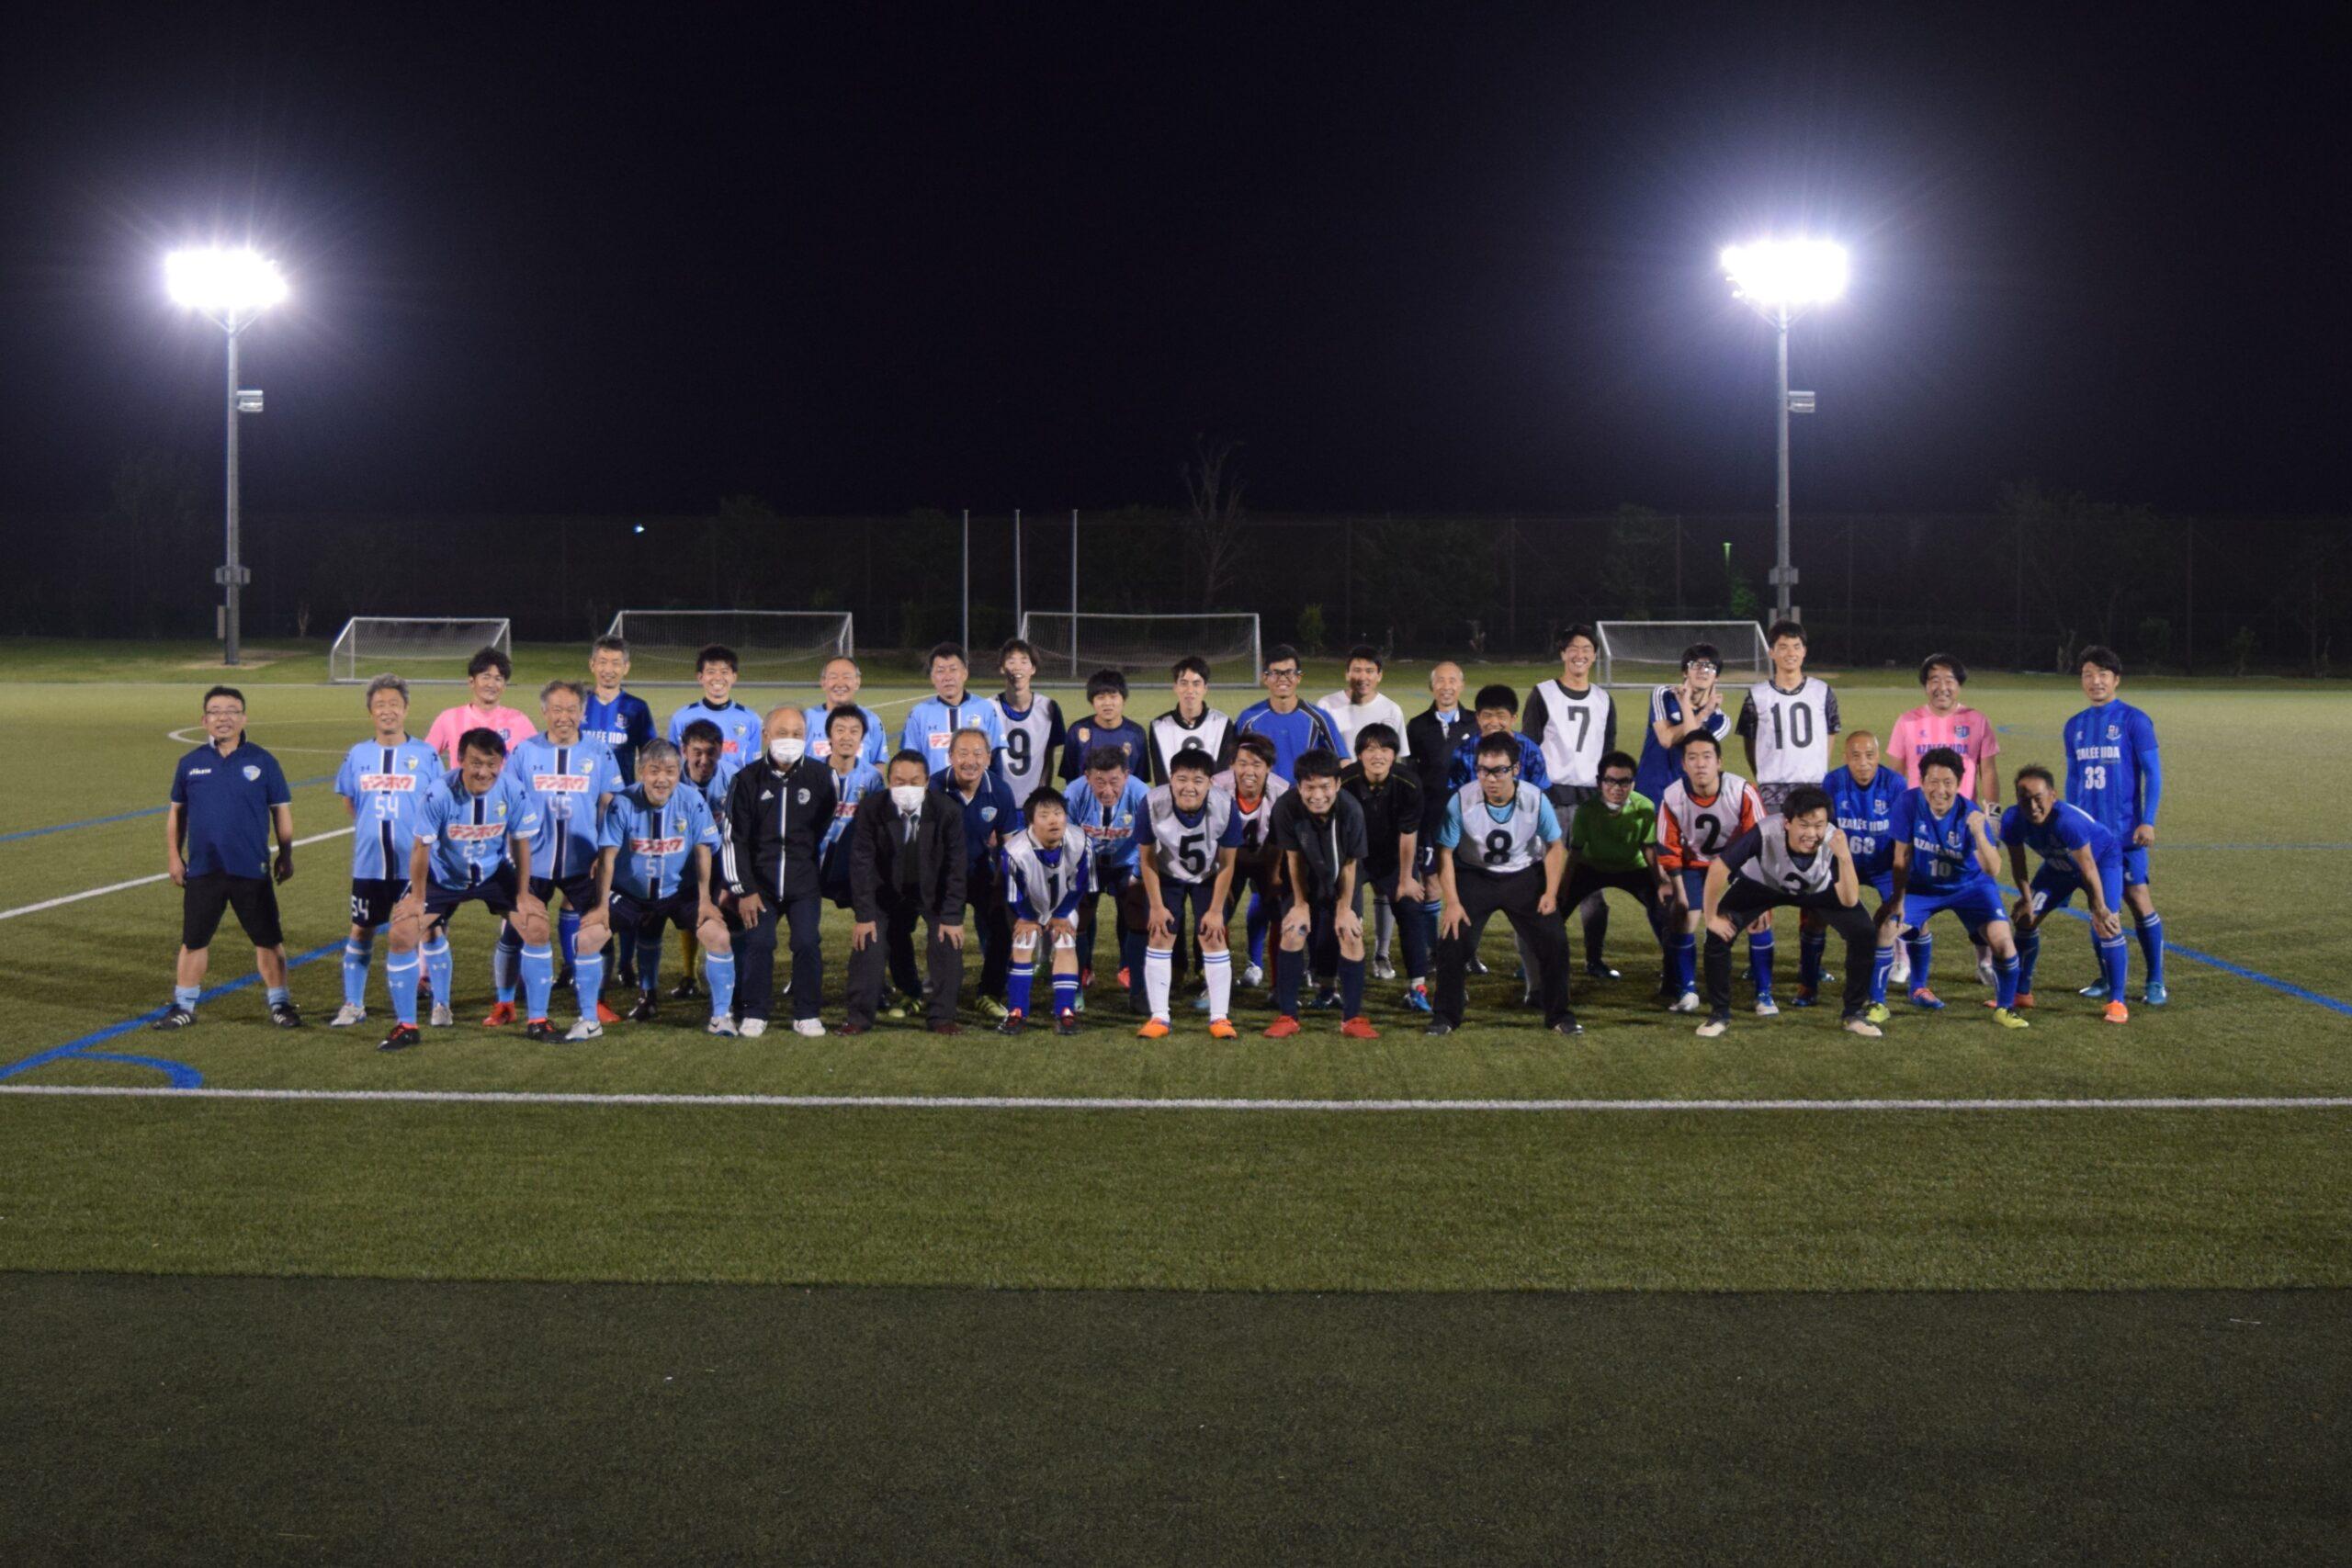 FCアビエスシニアO-50とアザリー飯田O-50と知的障がい者長野県代表トレーニングマッチ